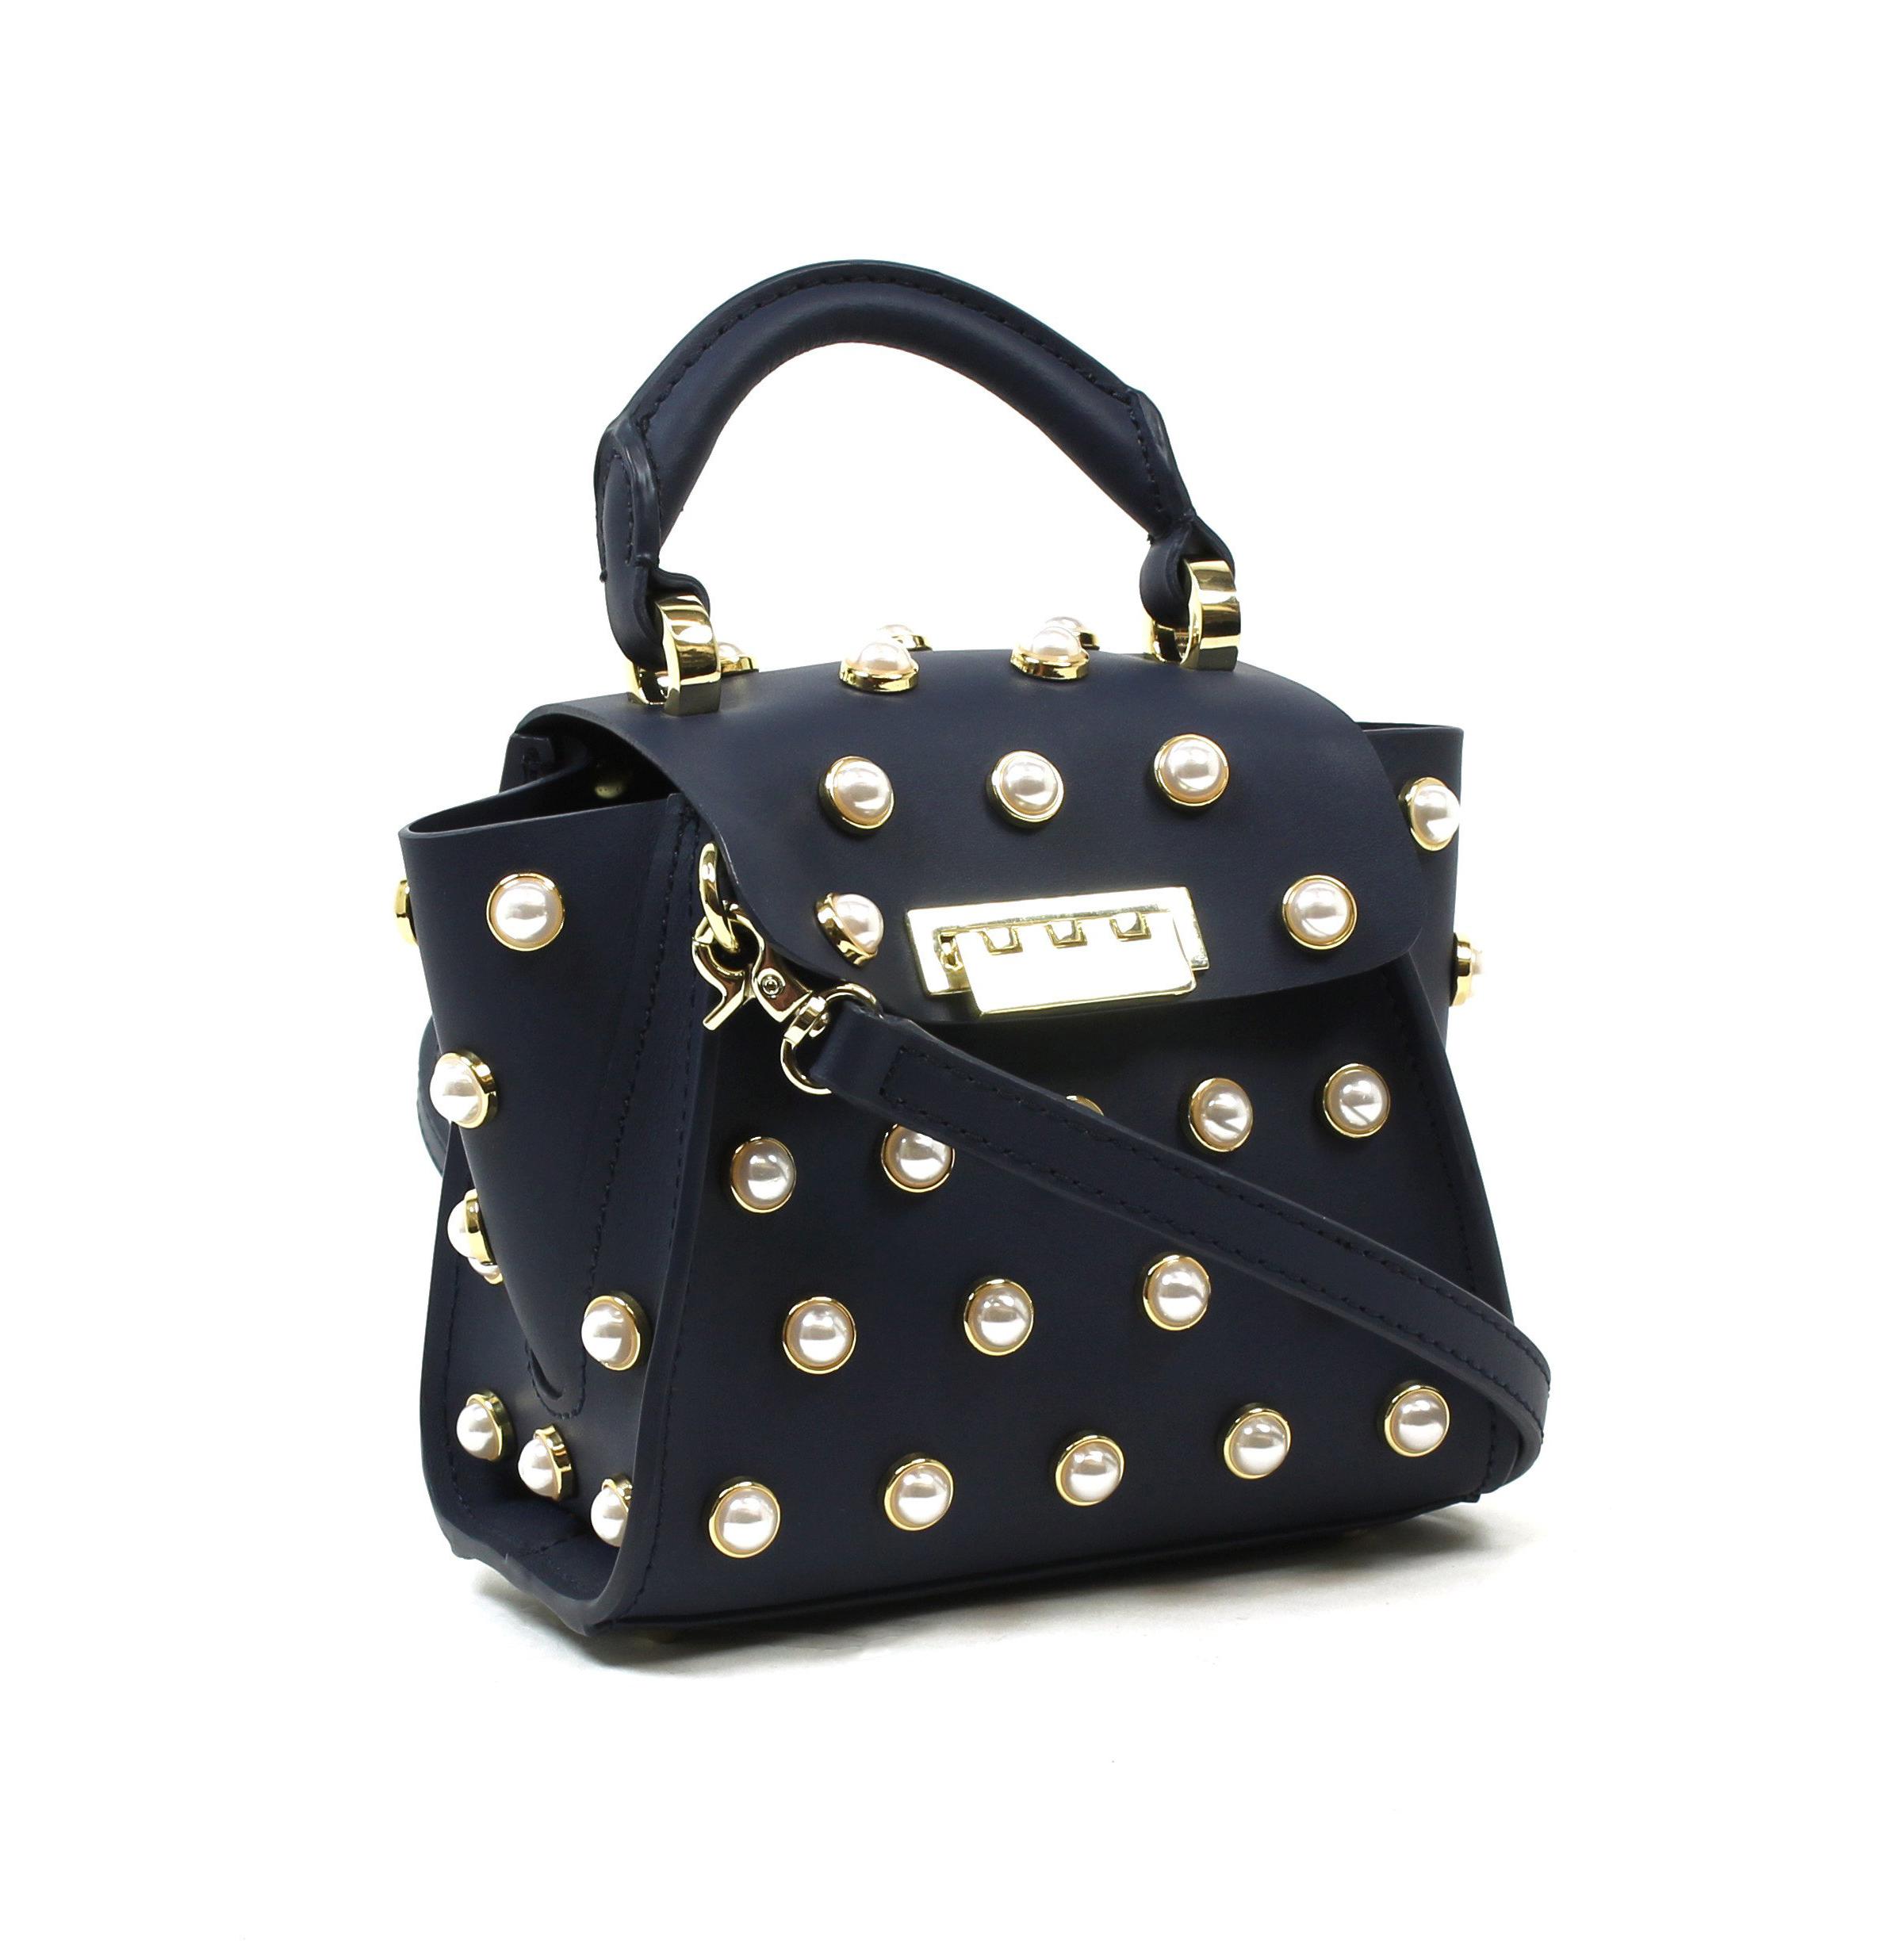 zac posen包 前美国第一夫人都爱的包包